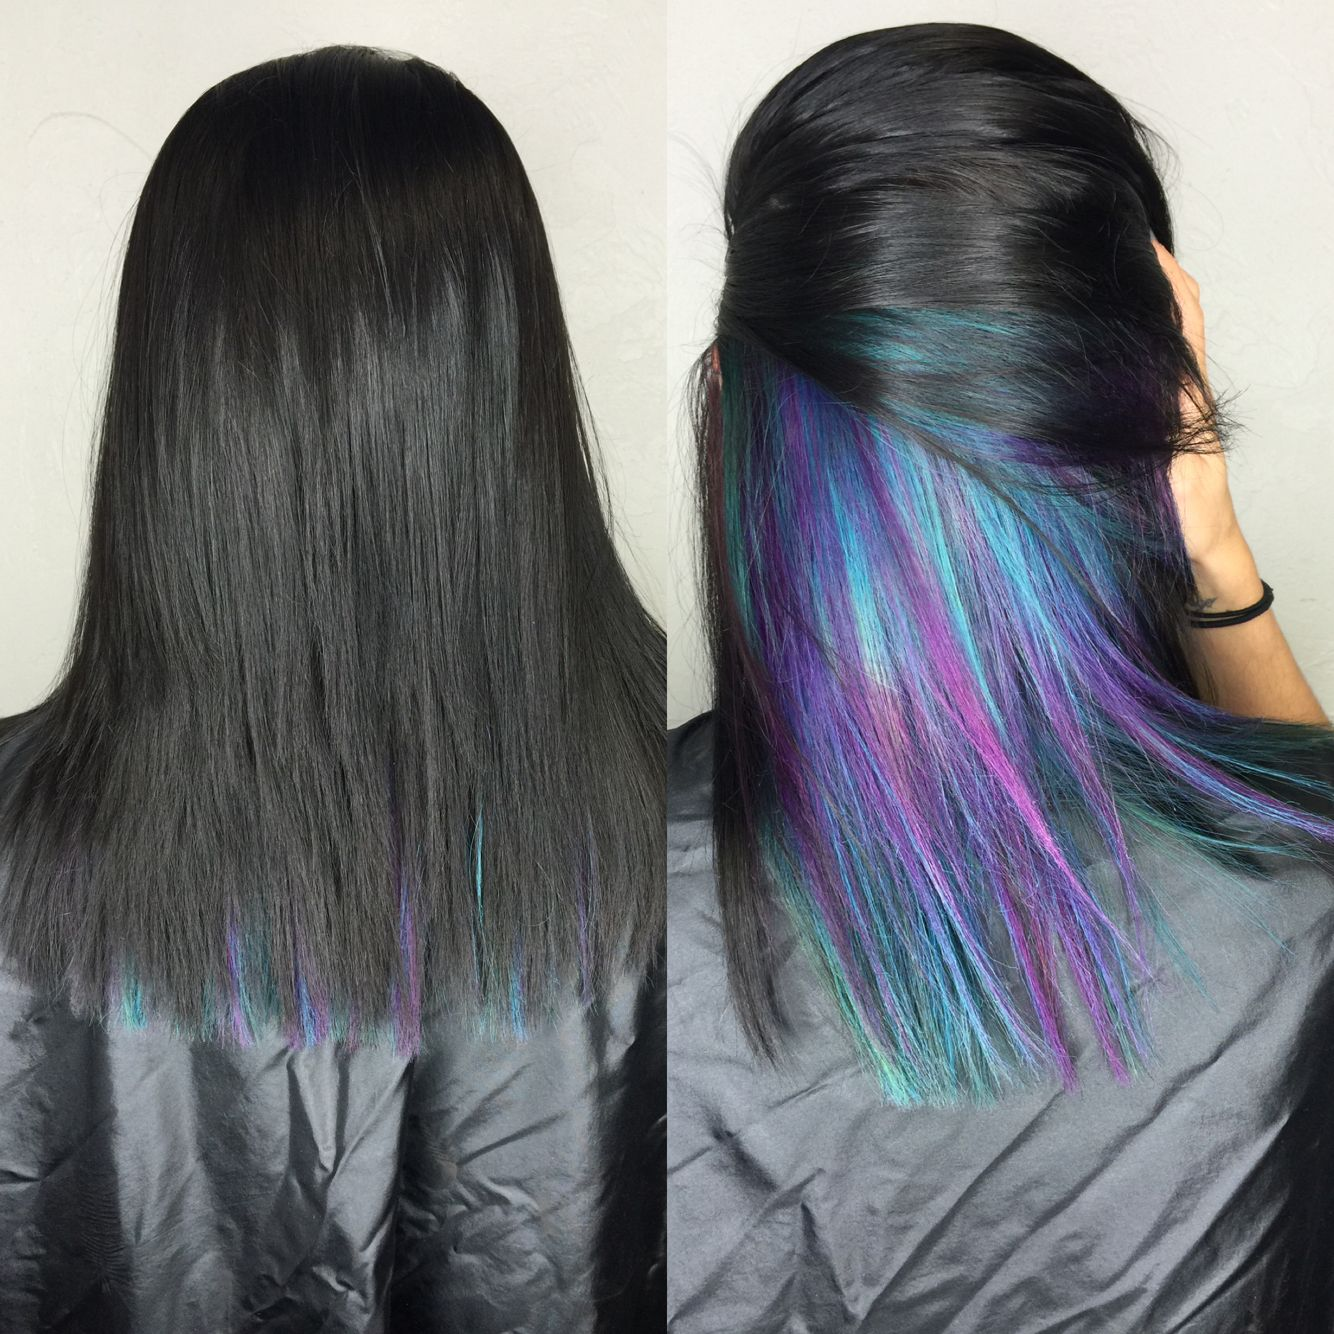 Black, teal, & purple hair #underlights #hairbyjessq